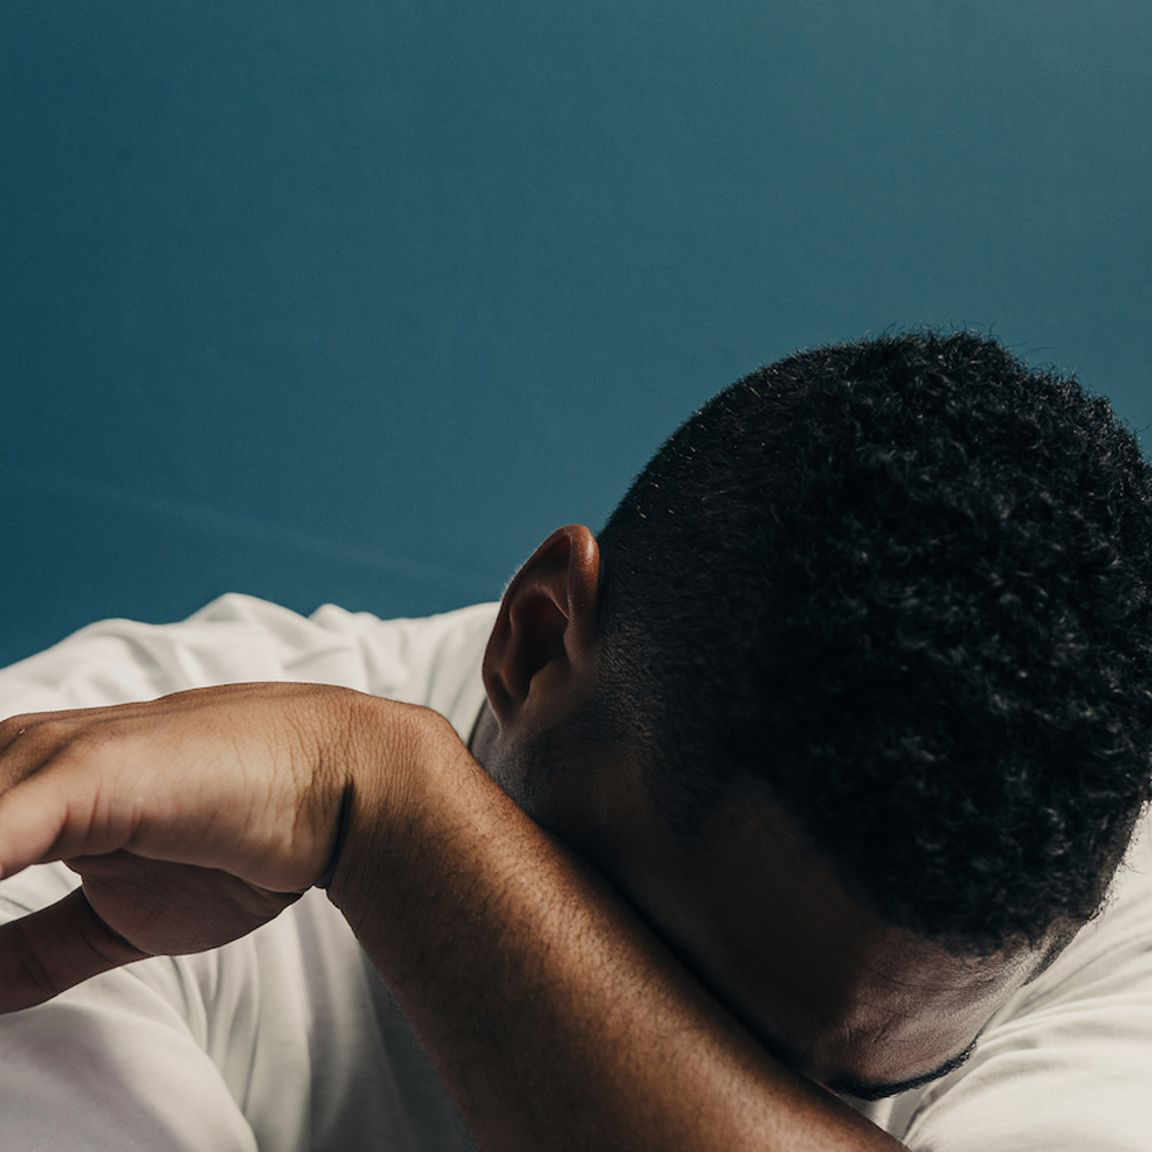 Fatigue & stress